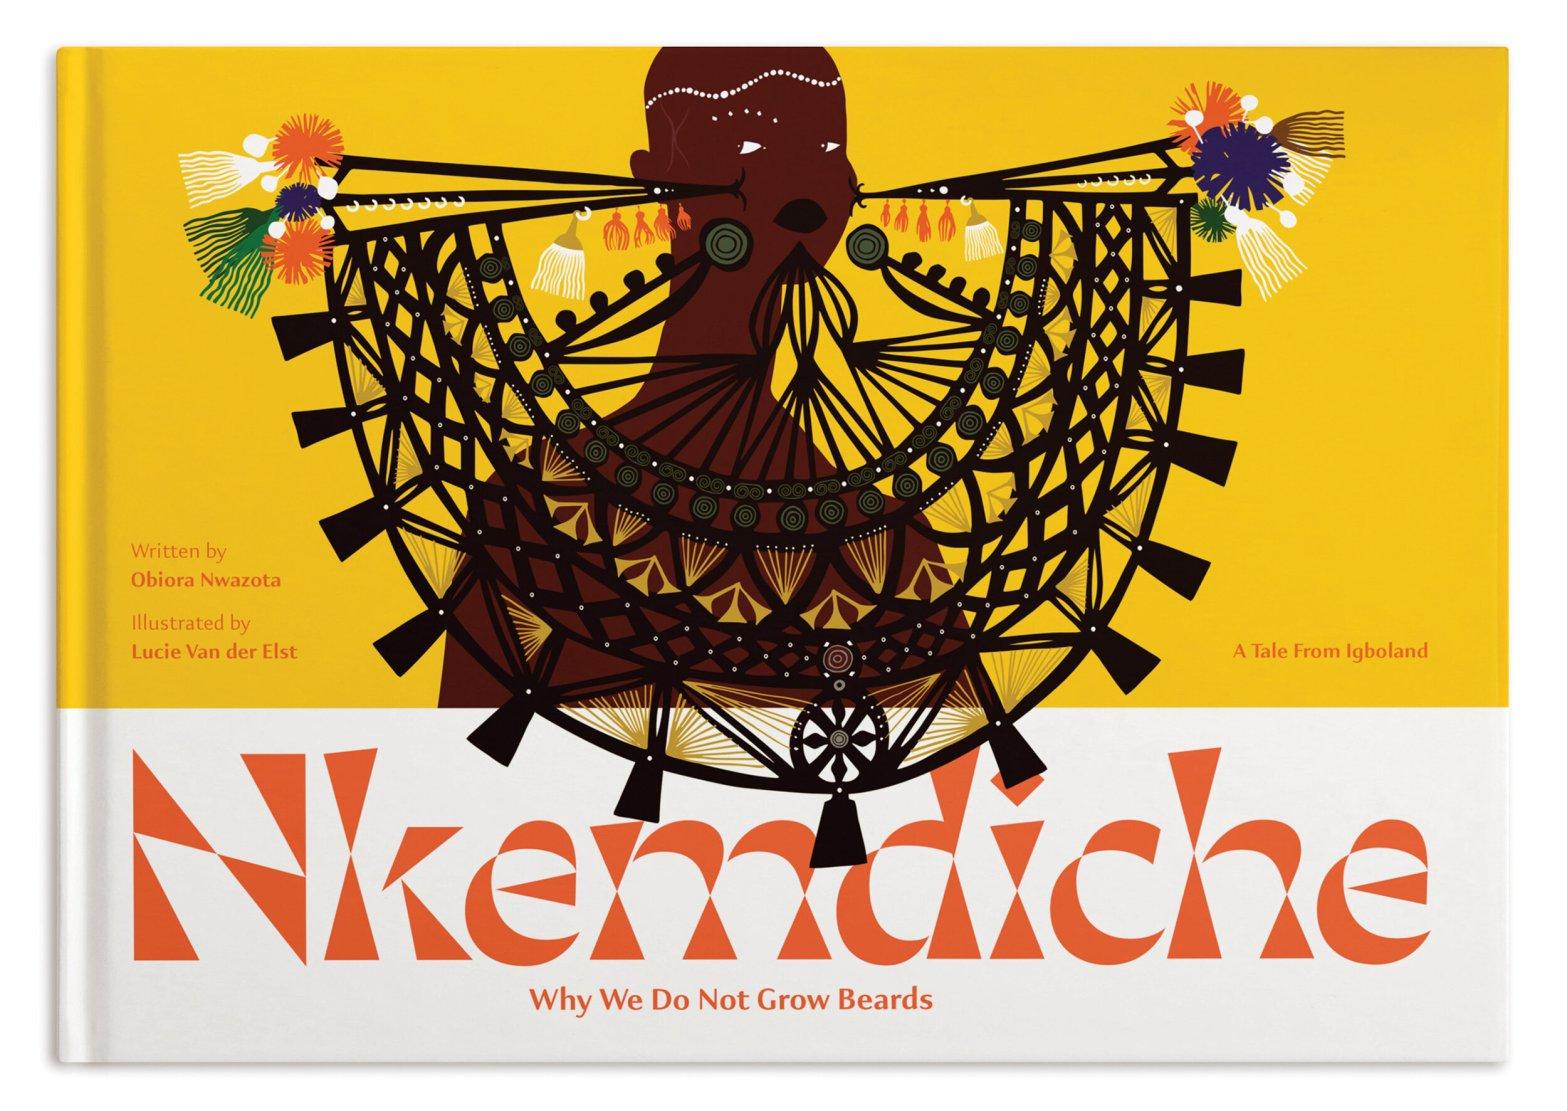 Thumbnail for The Daily Heller: Celebrating Nigerian Folk Tales